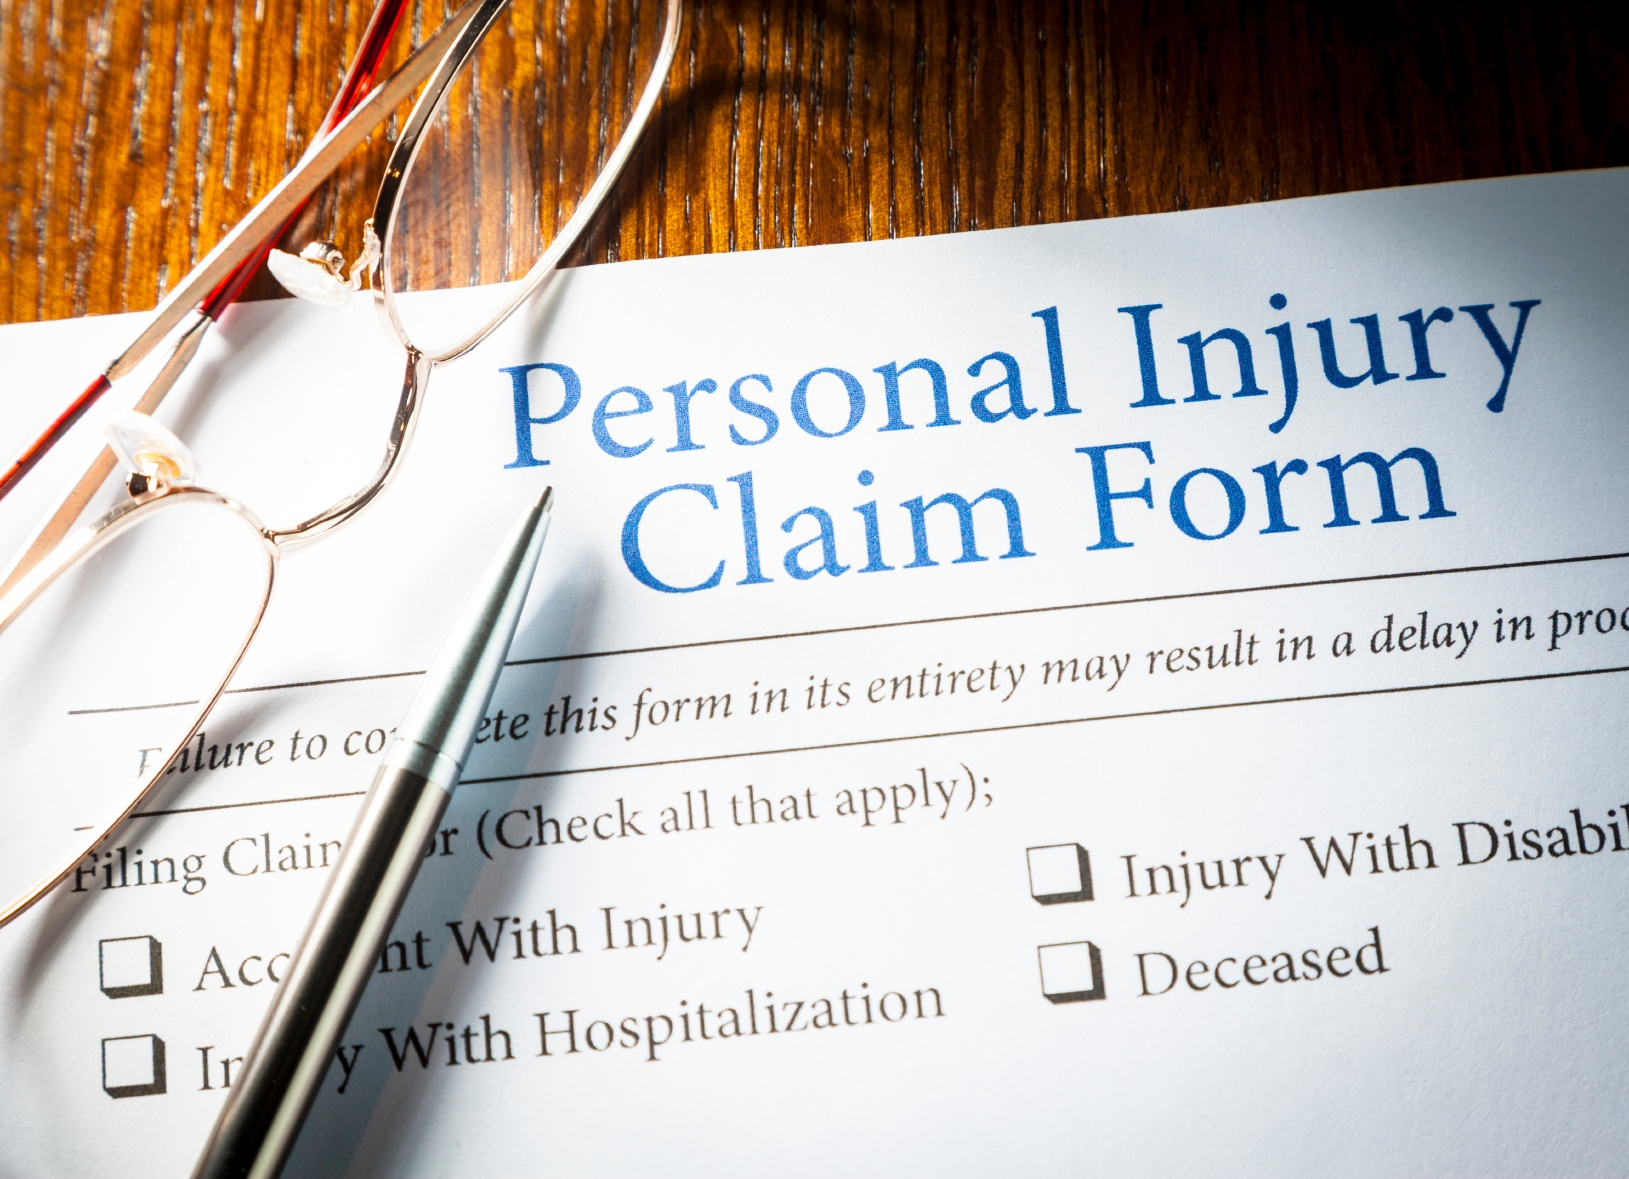 Atlanta Personal Injury Law Firm